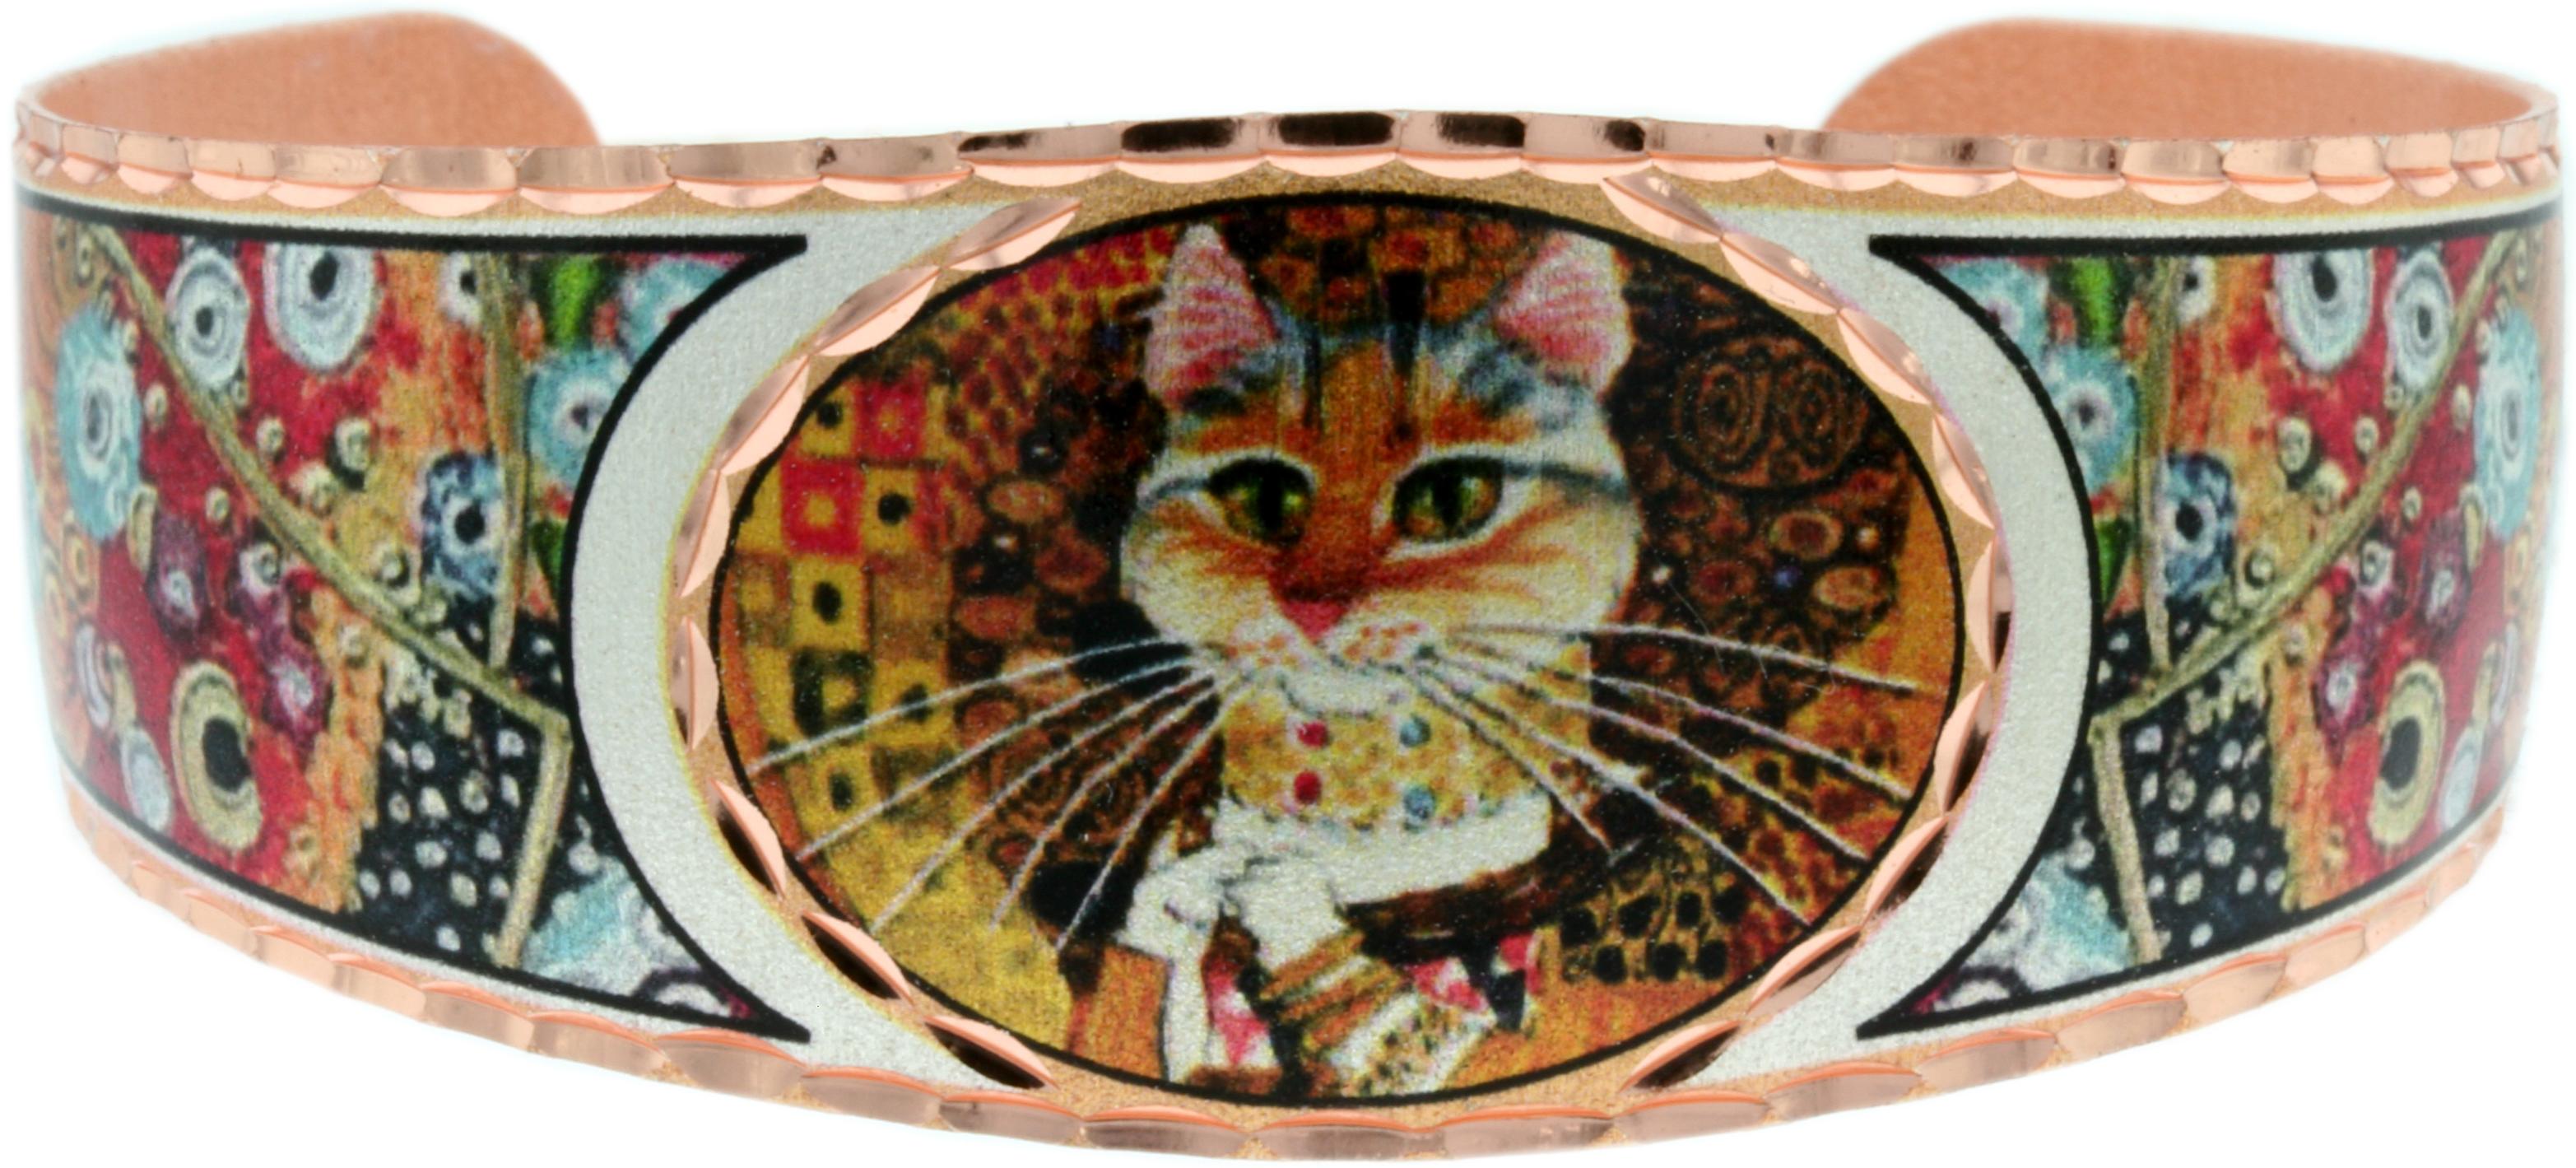 Art Jewelry Inspired By Gustav Klimt's Famous Paintings